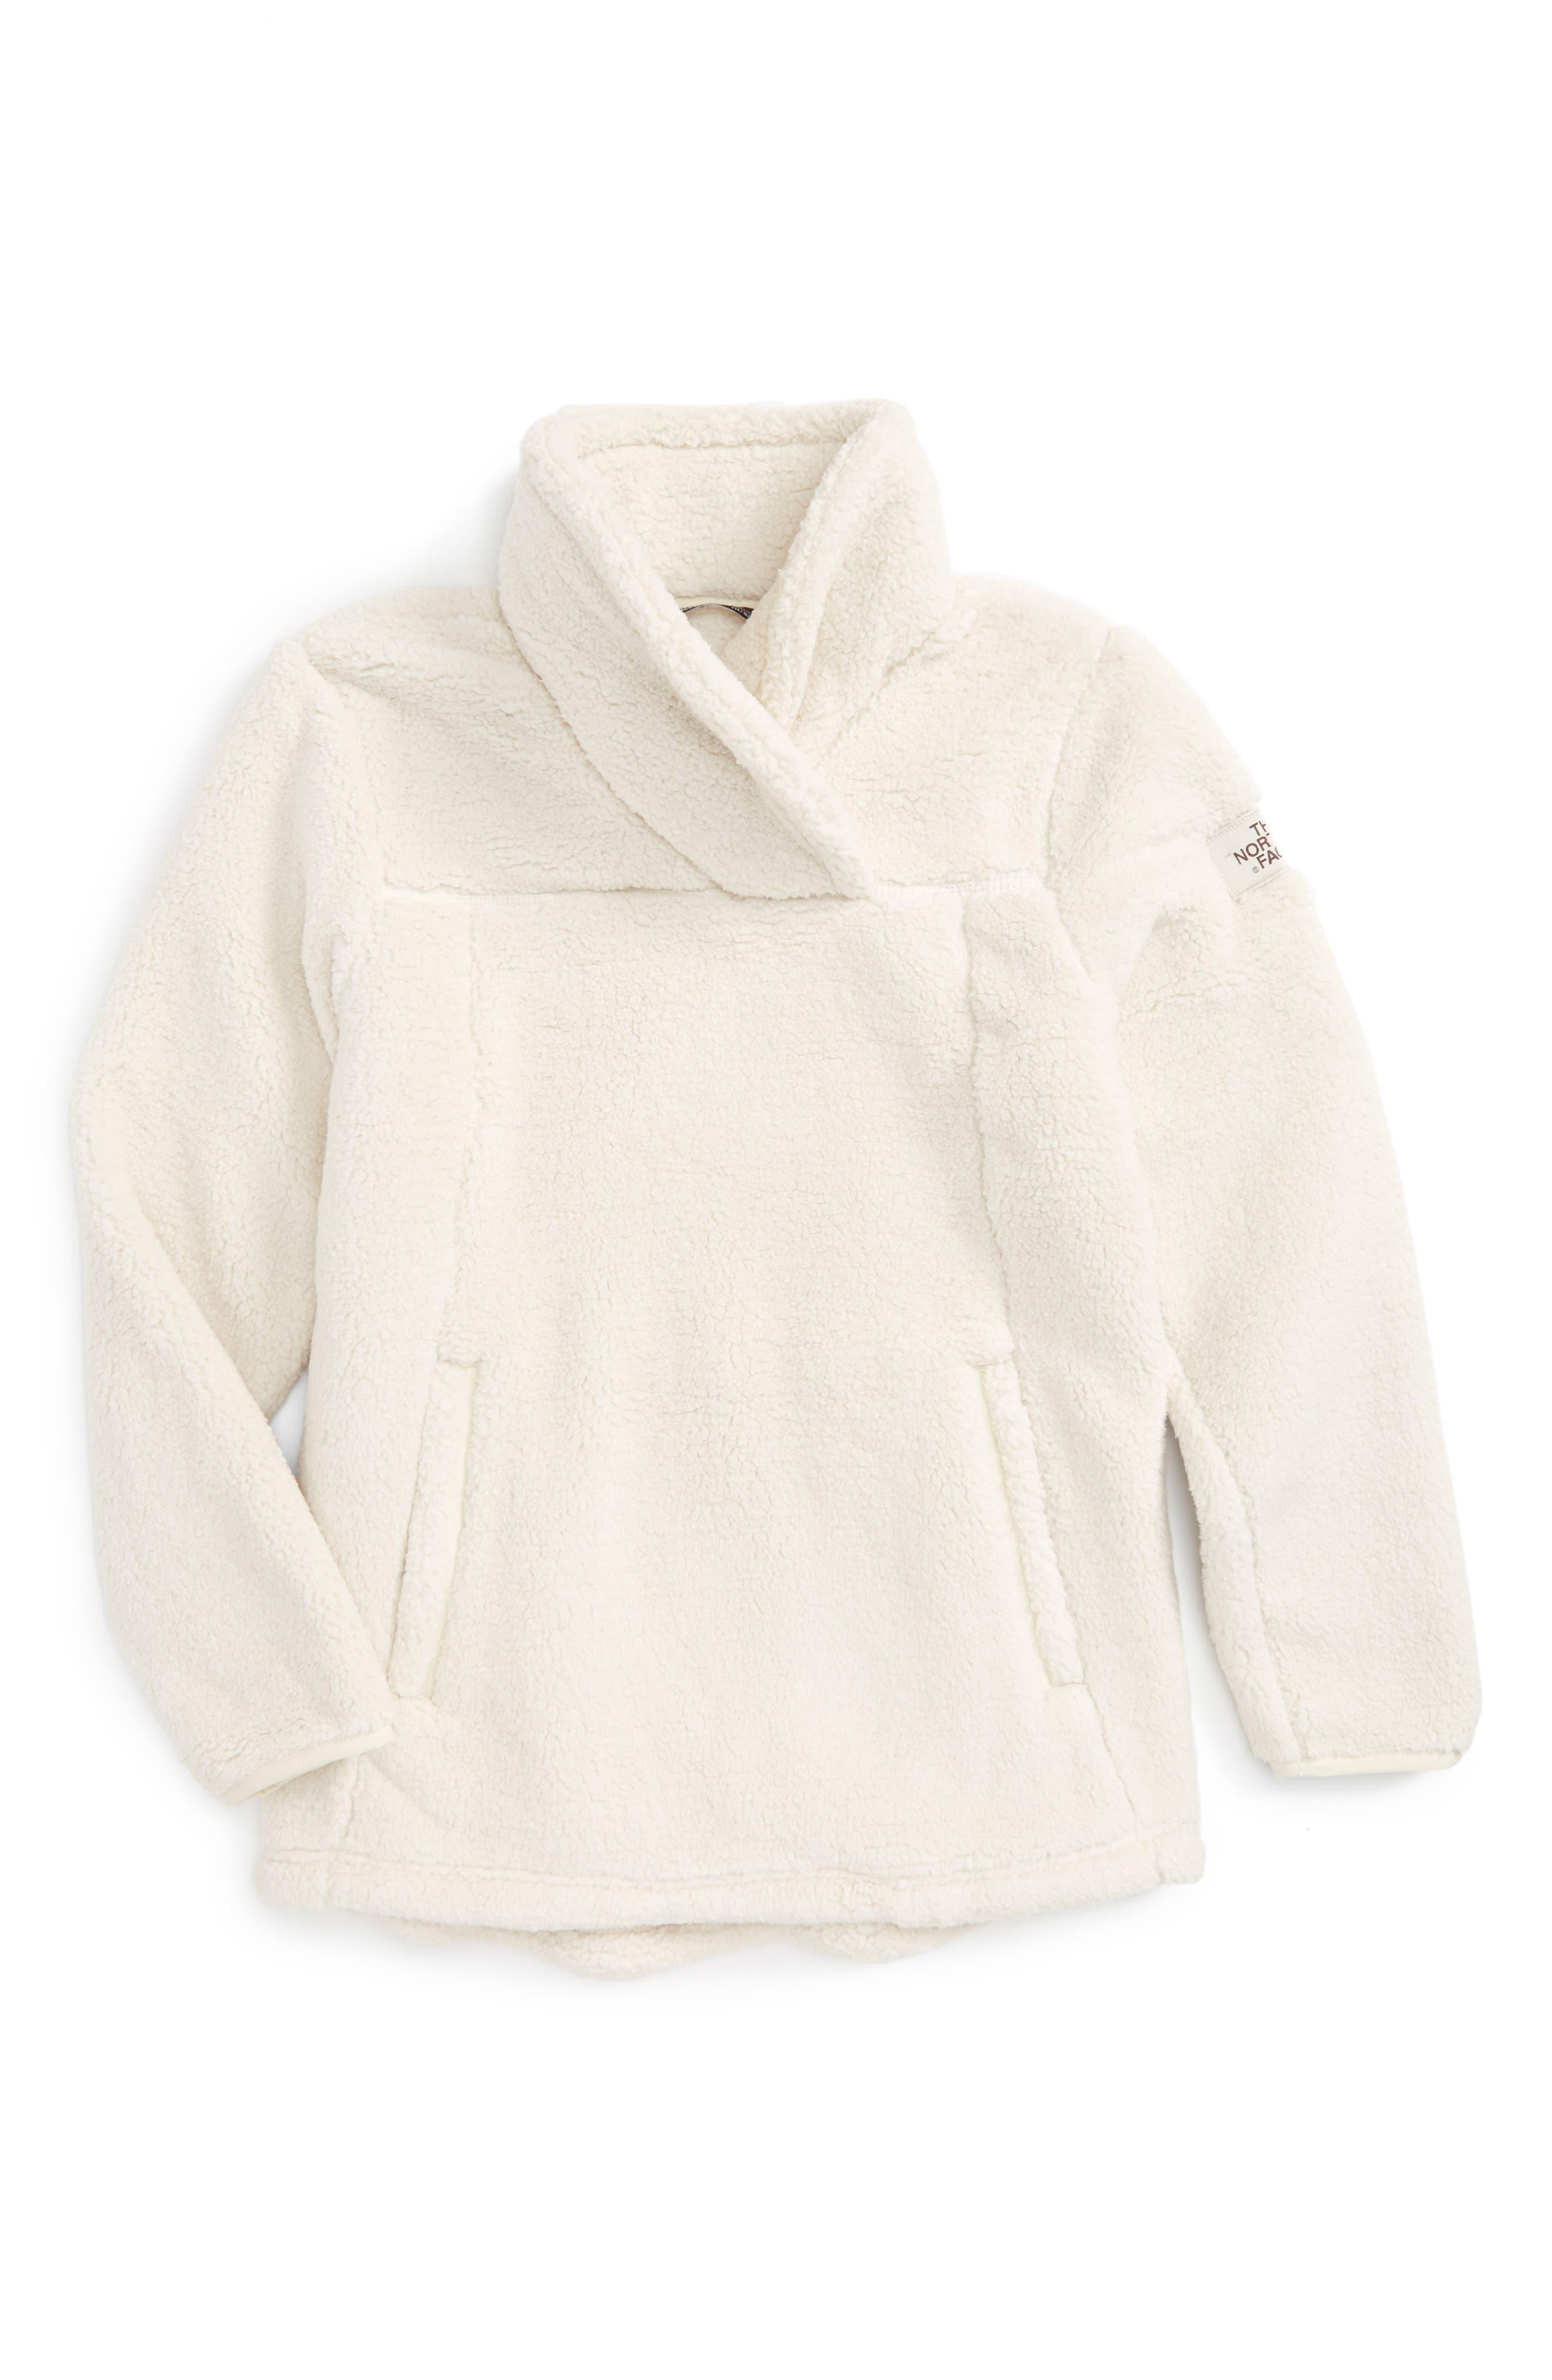 Khampfire Fleece Pullover,                             Main thumbnail 1, color,                             Vintage White